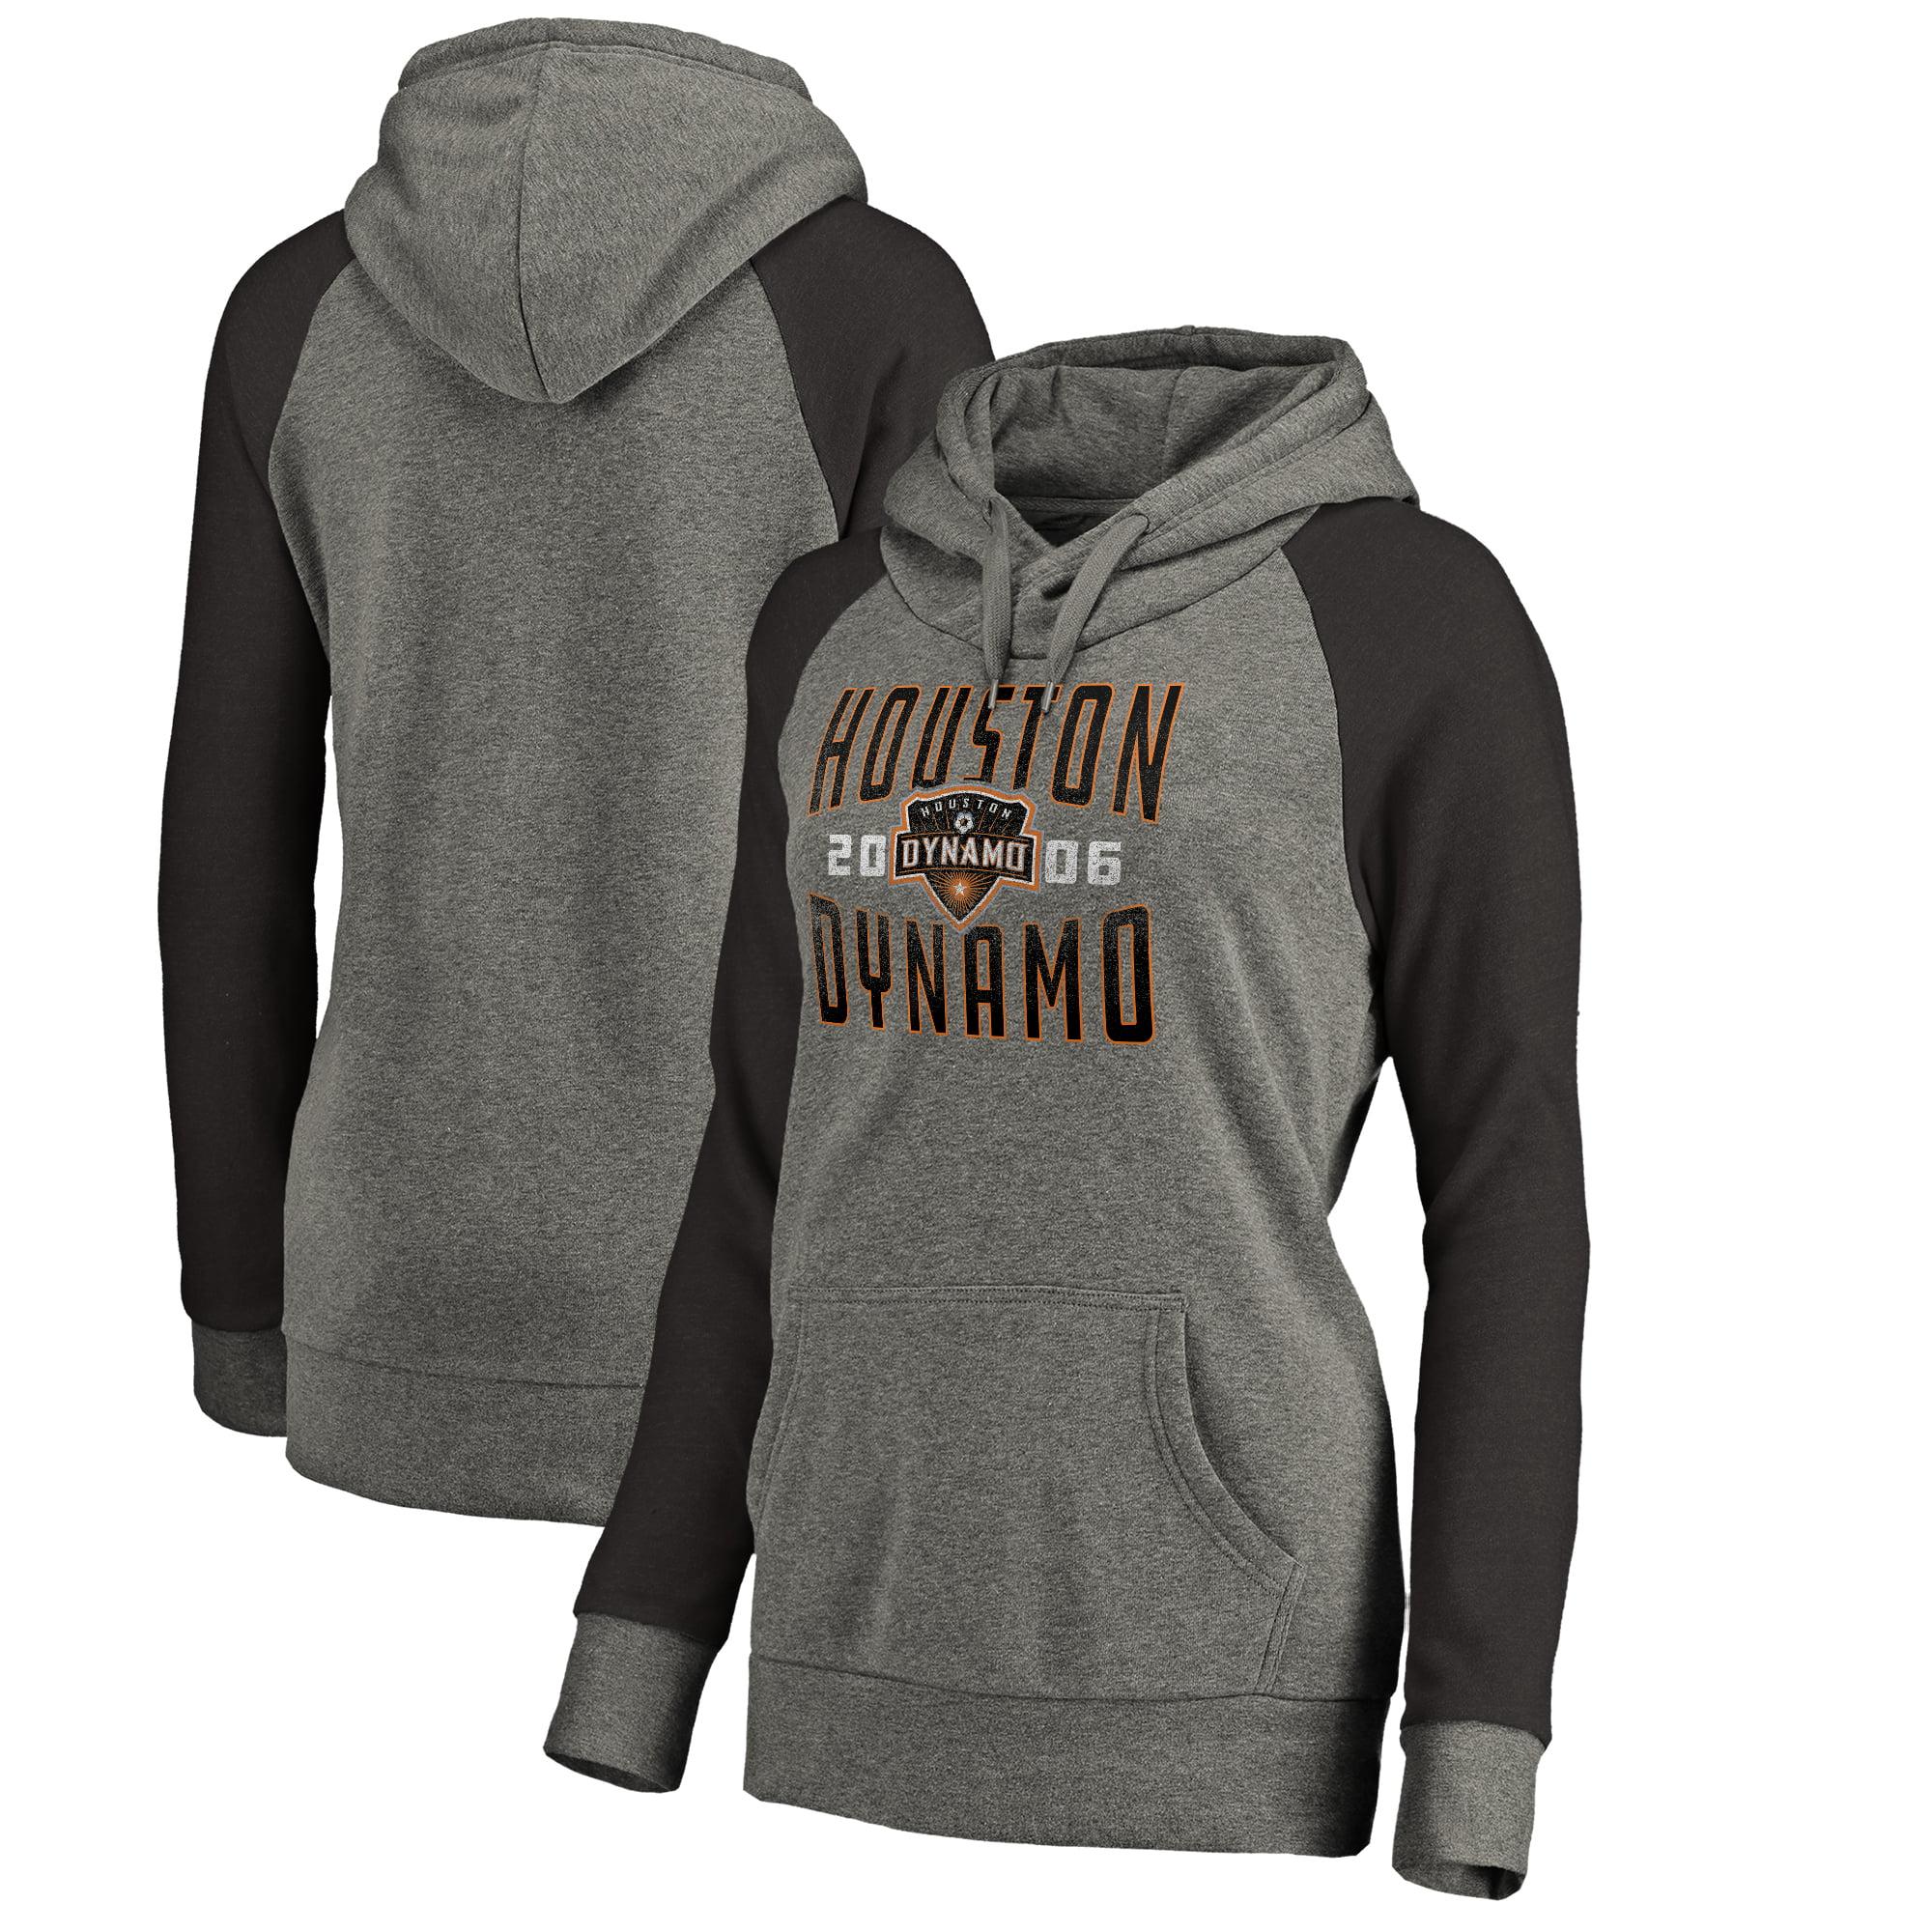 Houston Dynamo Fanatics Branded Women's Antique Stack Tri-Blend Raglan Pullover Hoodie - Heathered Gray